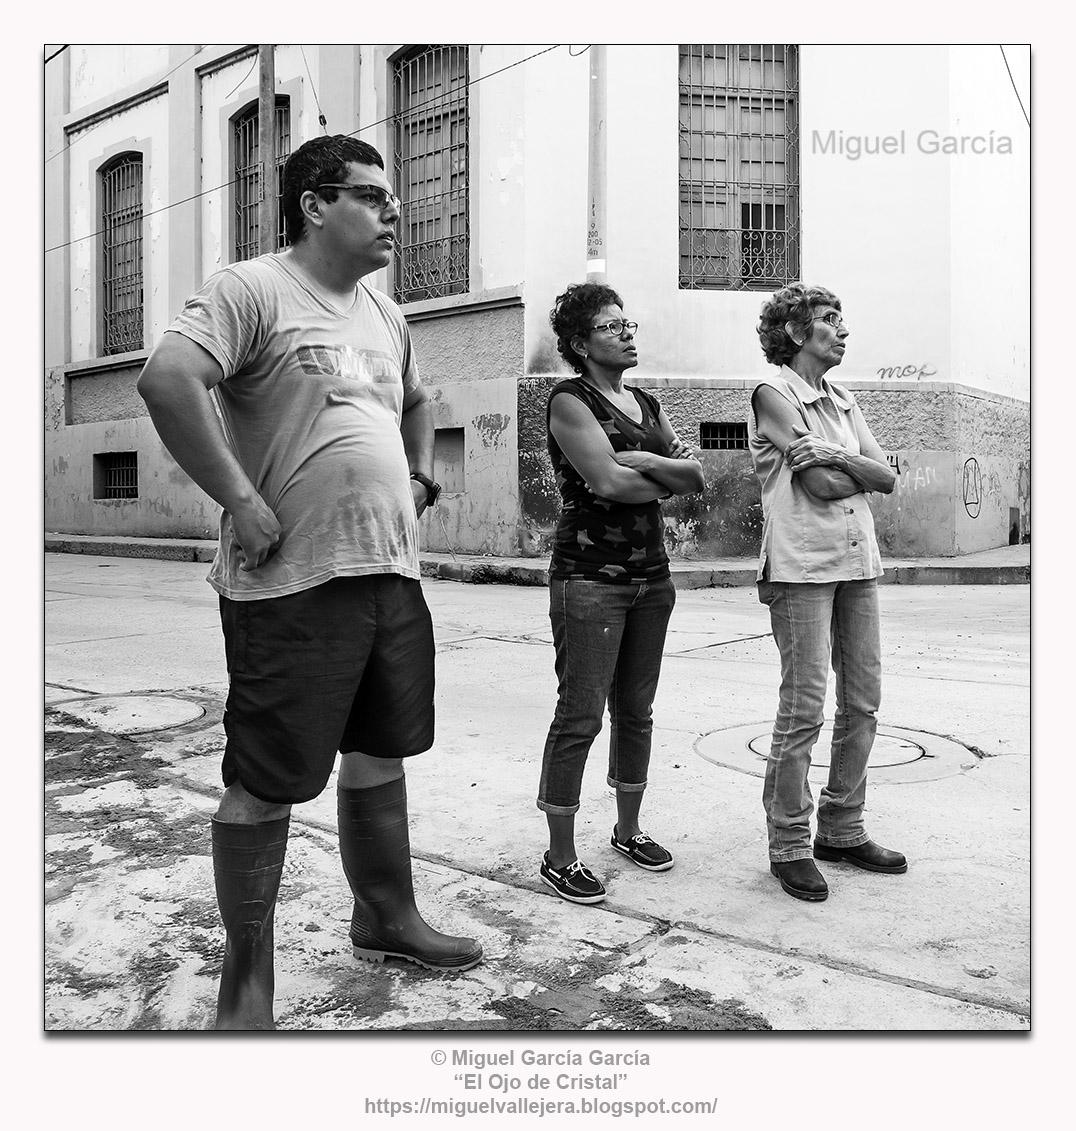 Fenómeno del Niño 2017, Piura (Perú). José Rodolfo, Srta. Flor, Sra. Albán.